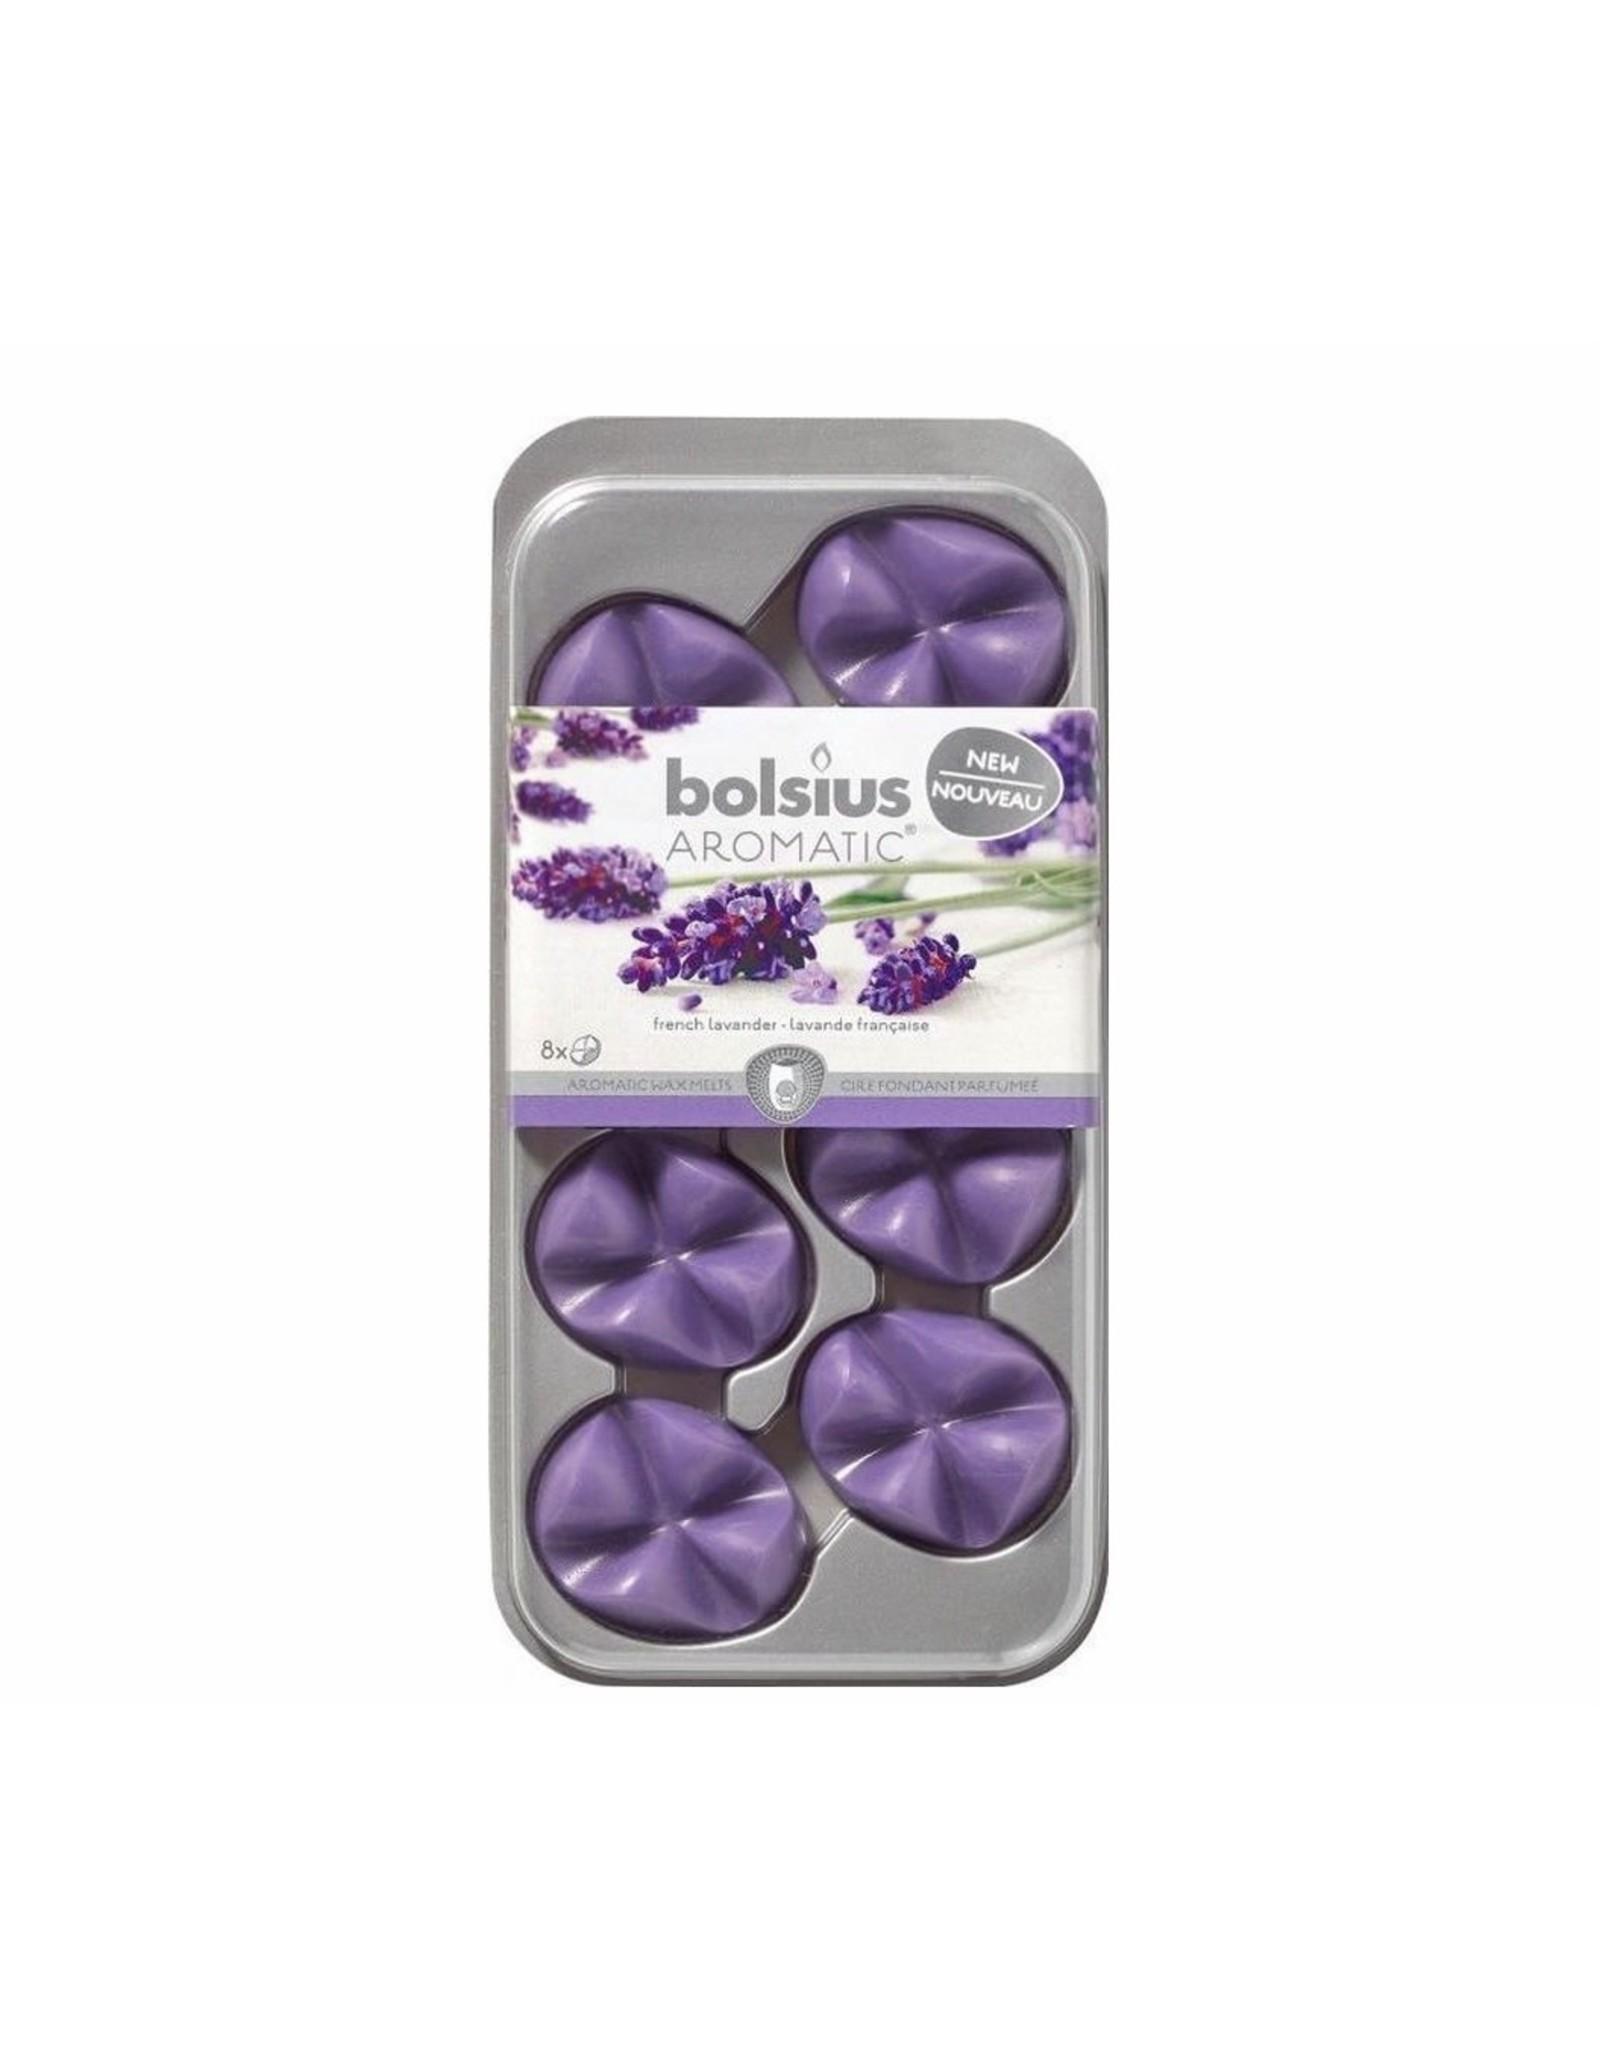 Bolsius Aromatic Wax Melts - Lavendel